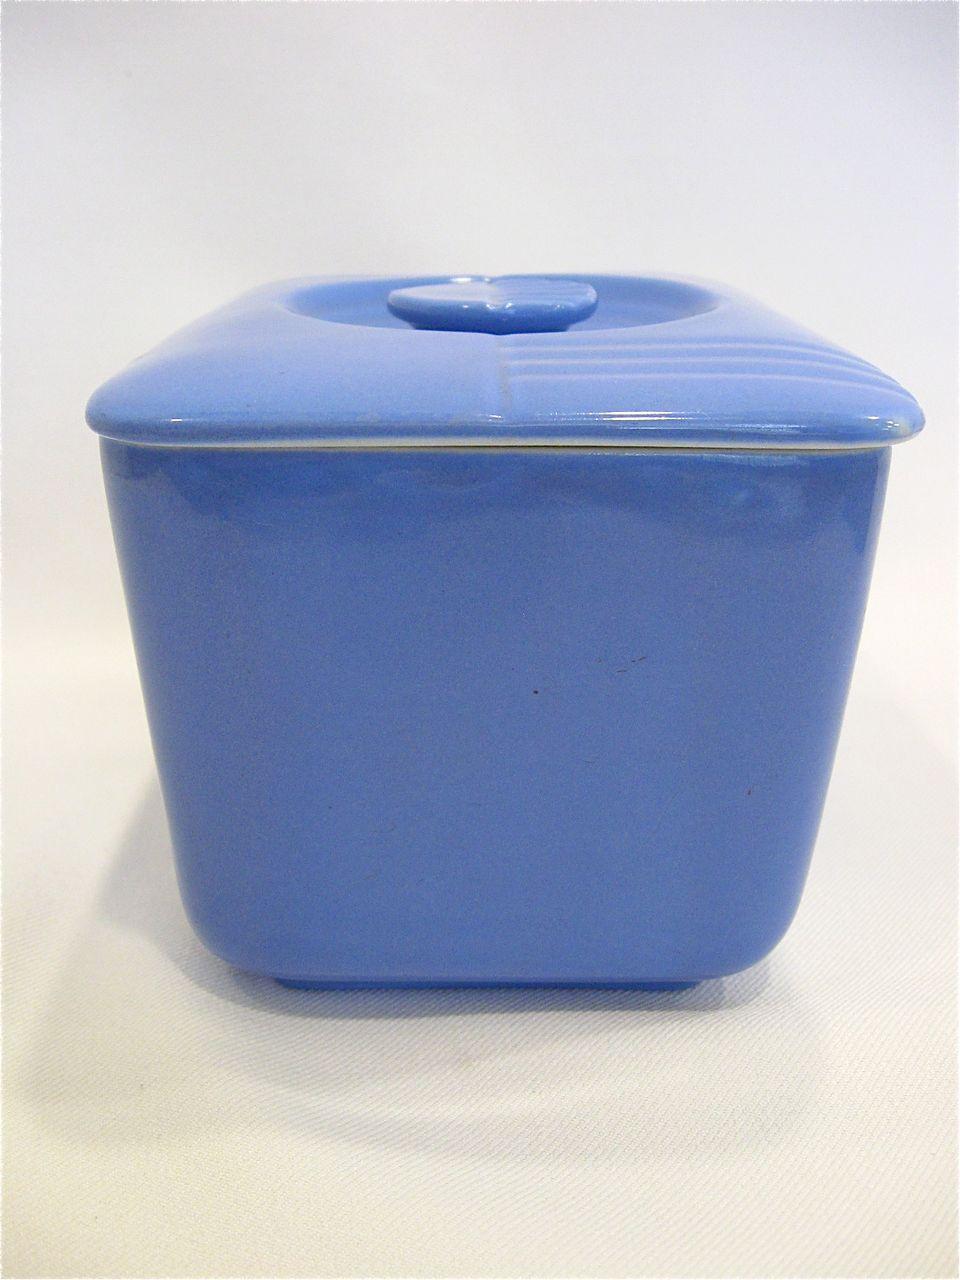 Hall China Westinghouse Blue Refrigerator Leftover Dish